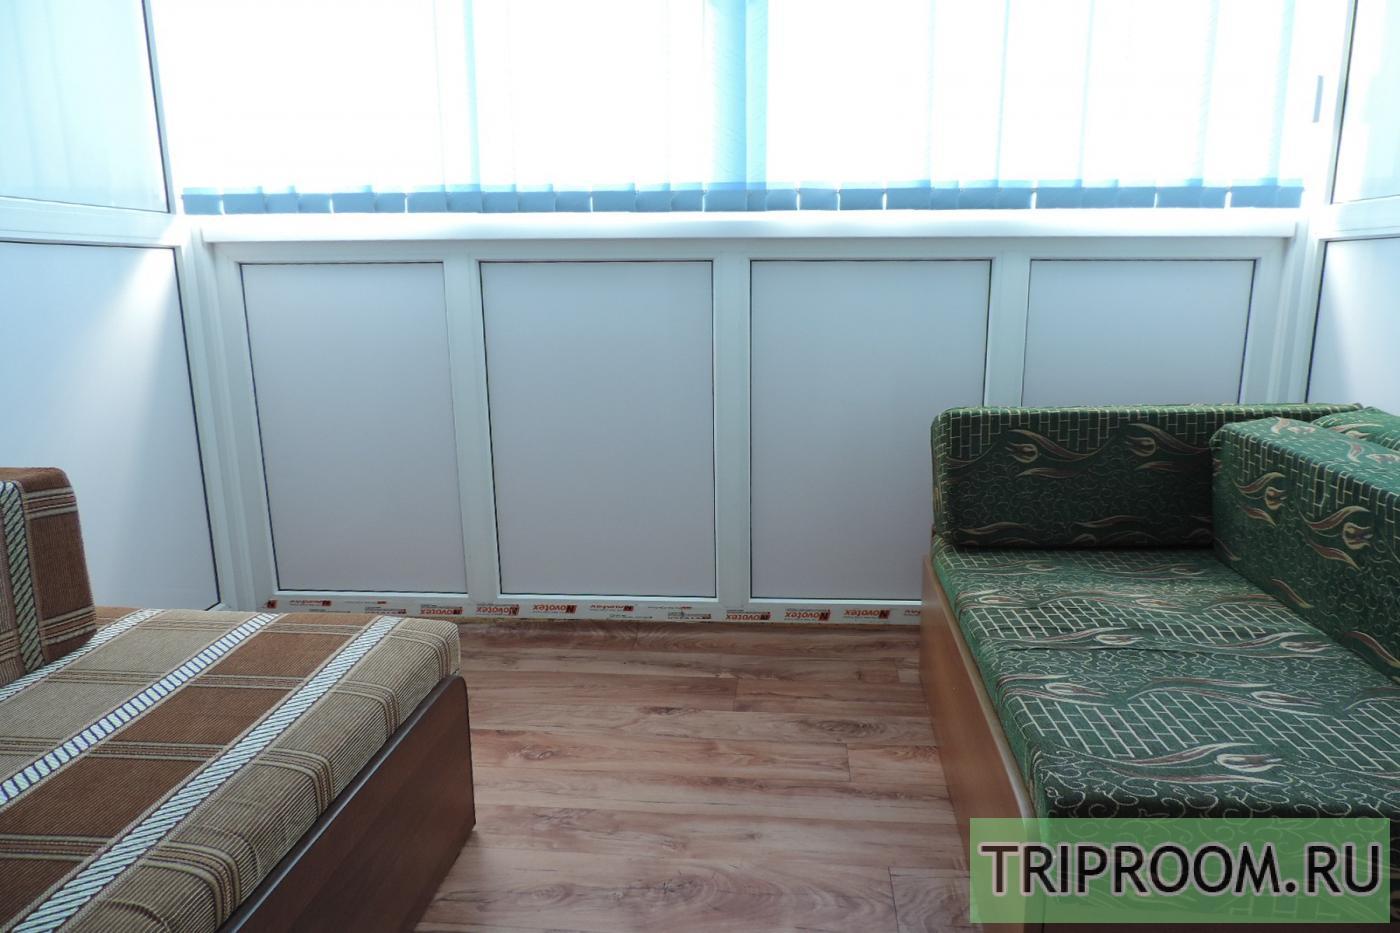 1-комнатная квартира посуточно (вариант № 734), ул. Лазарева улица, фото № 8